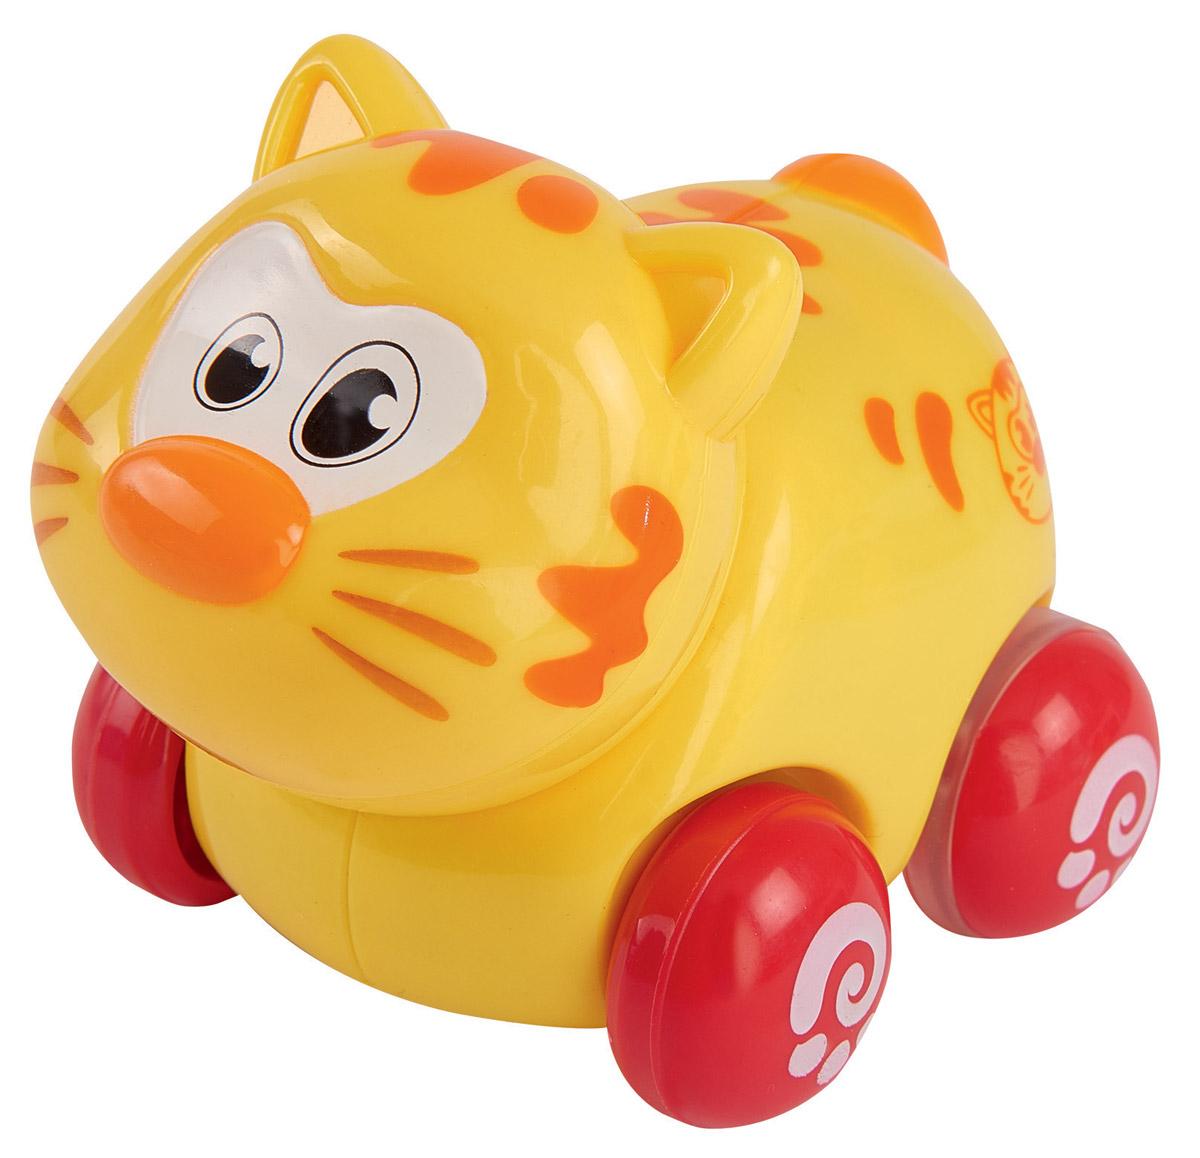 Simba Машинка-игрушка Котик simba abc машинка с пультом